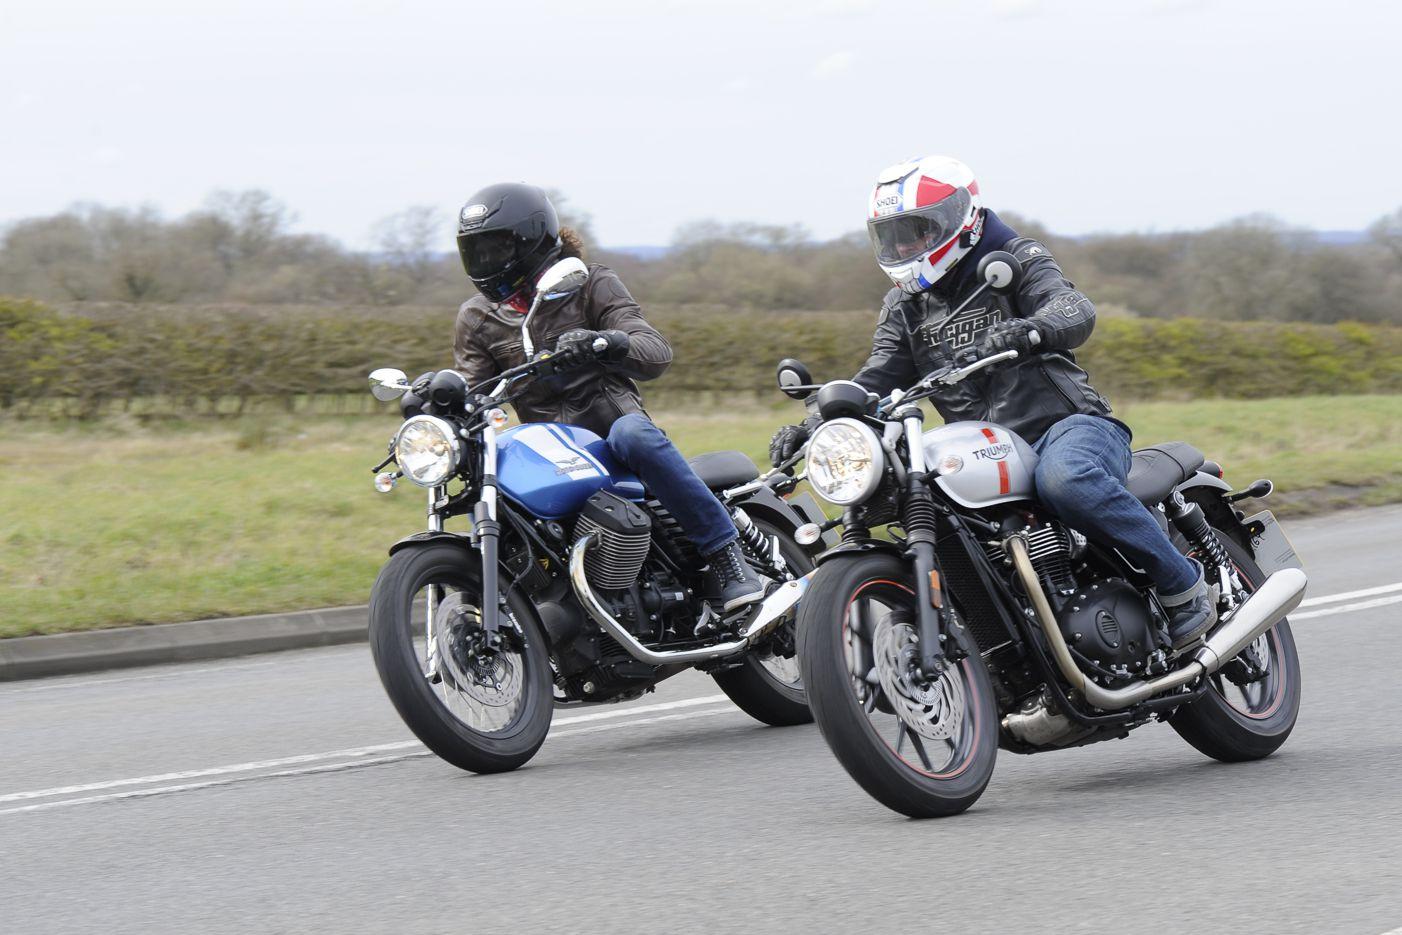 Yamaha Versus Susuki Motorcycles